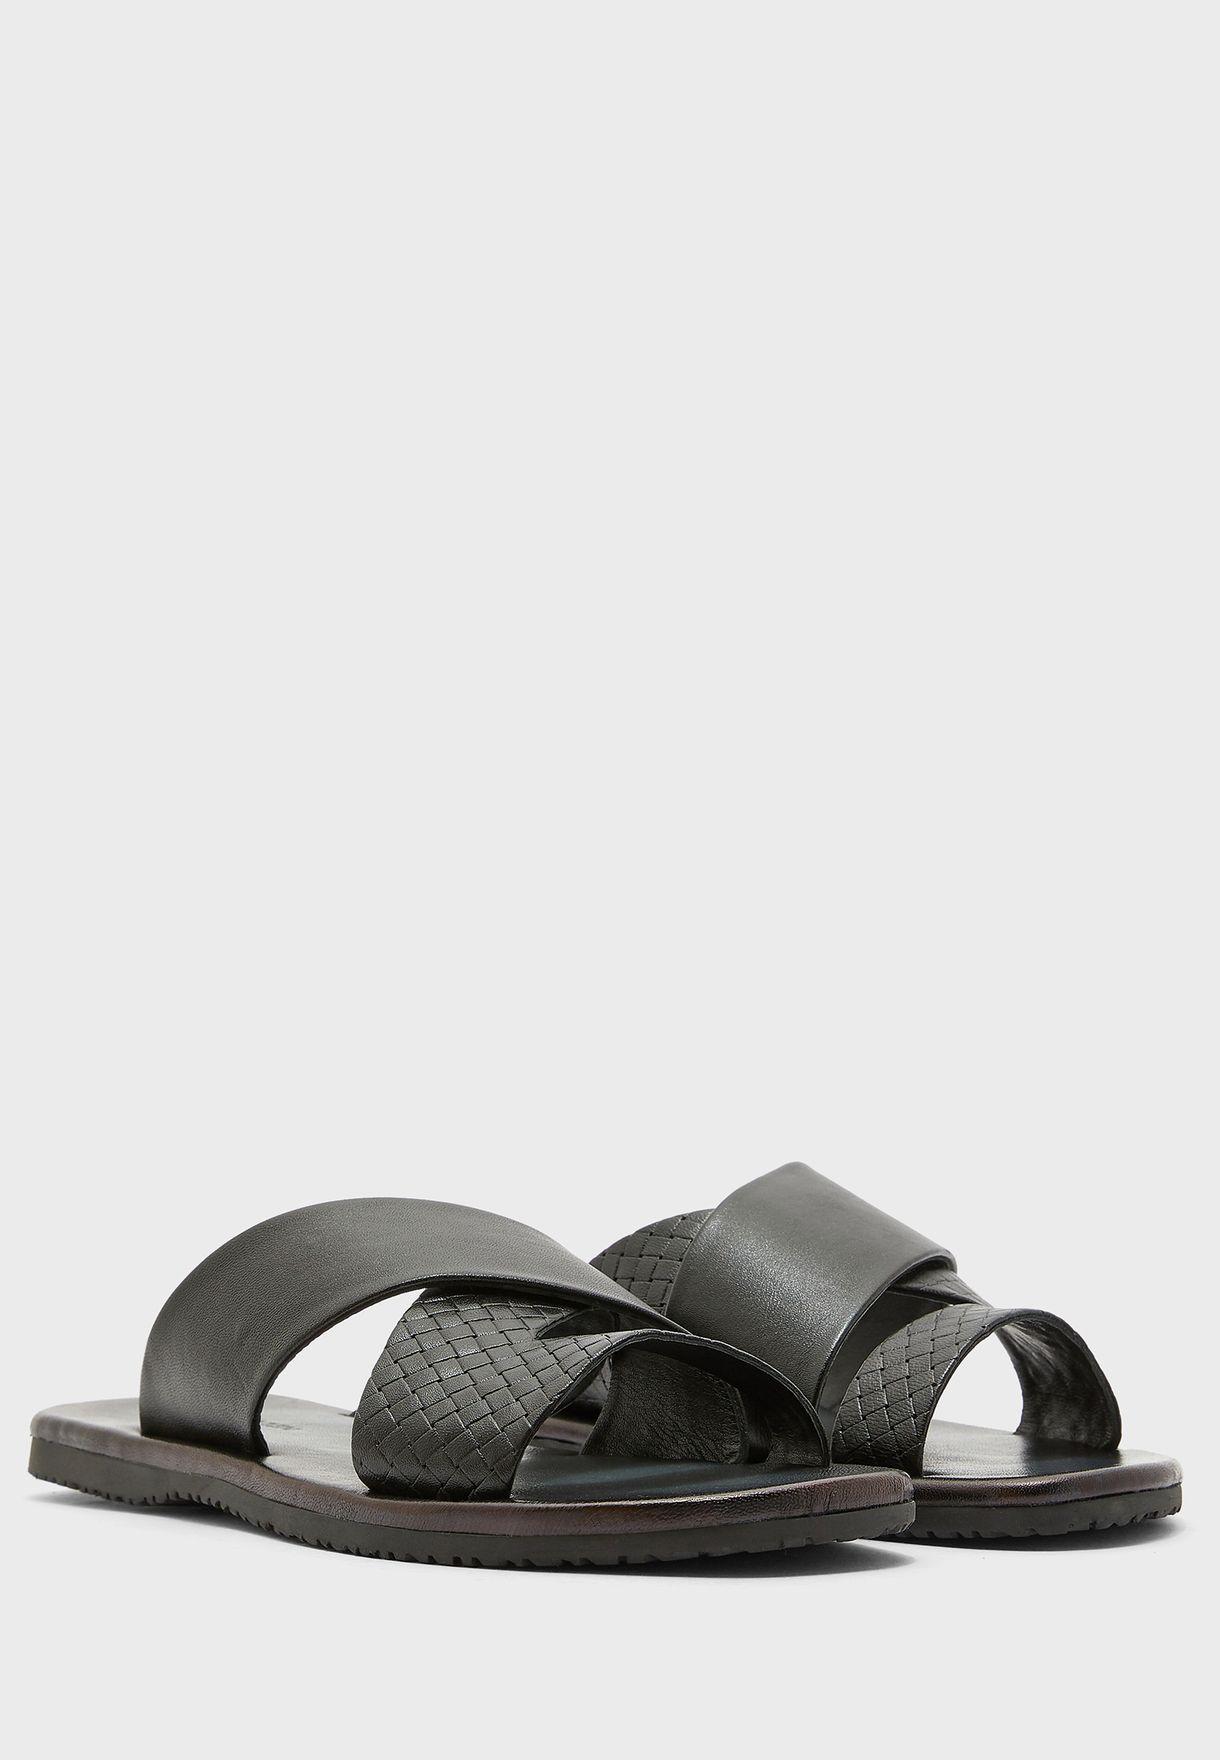 Gone Sandal